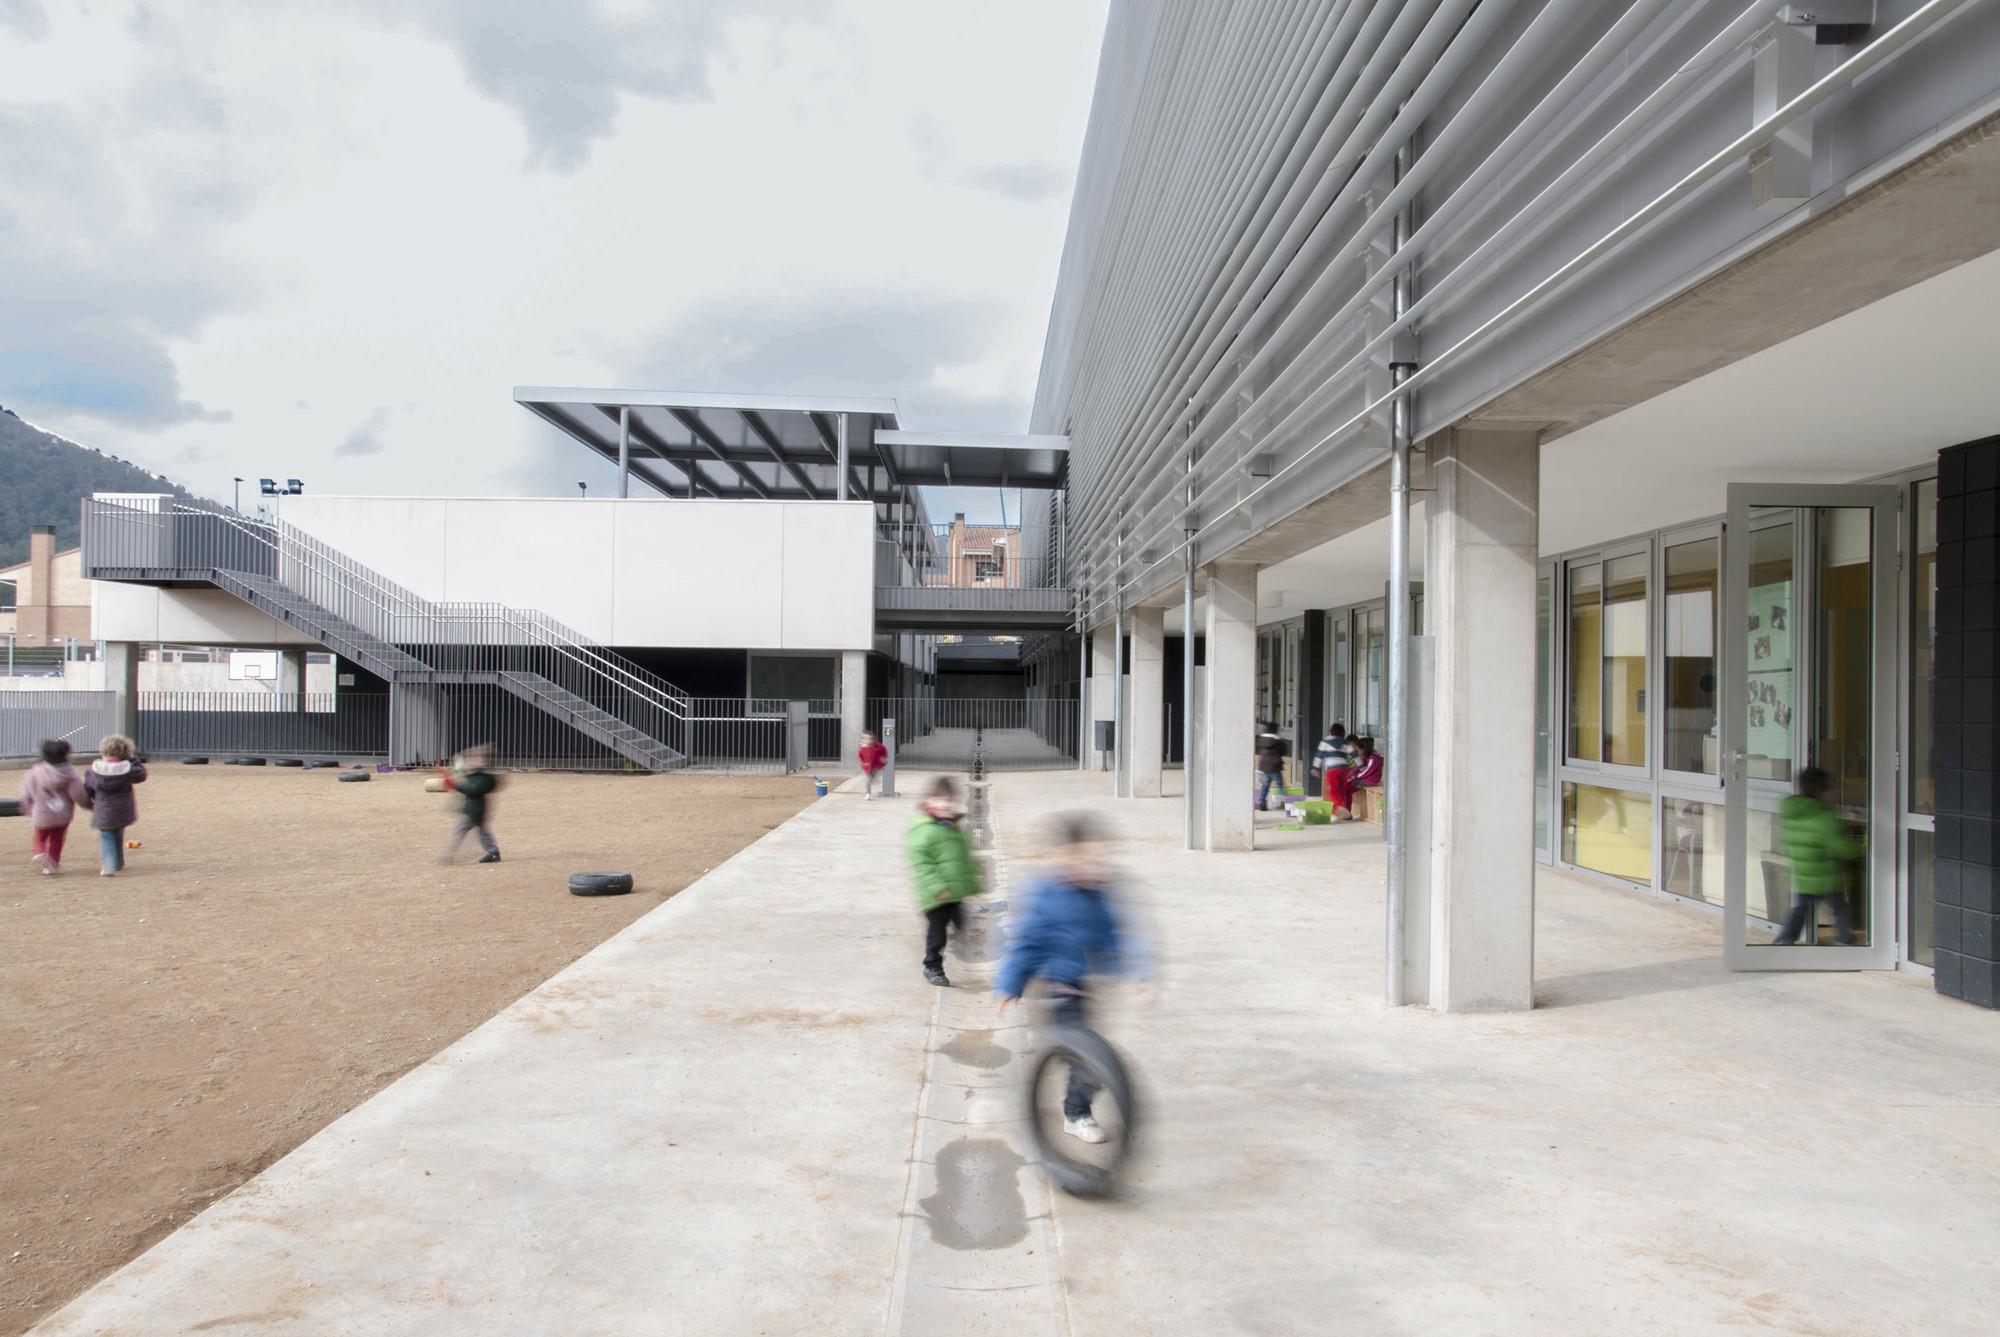 New Cervelló School / BCQ Arquitectura, Courtesy of BCQ Arquitectura